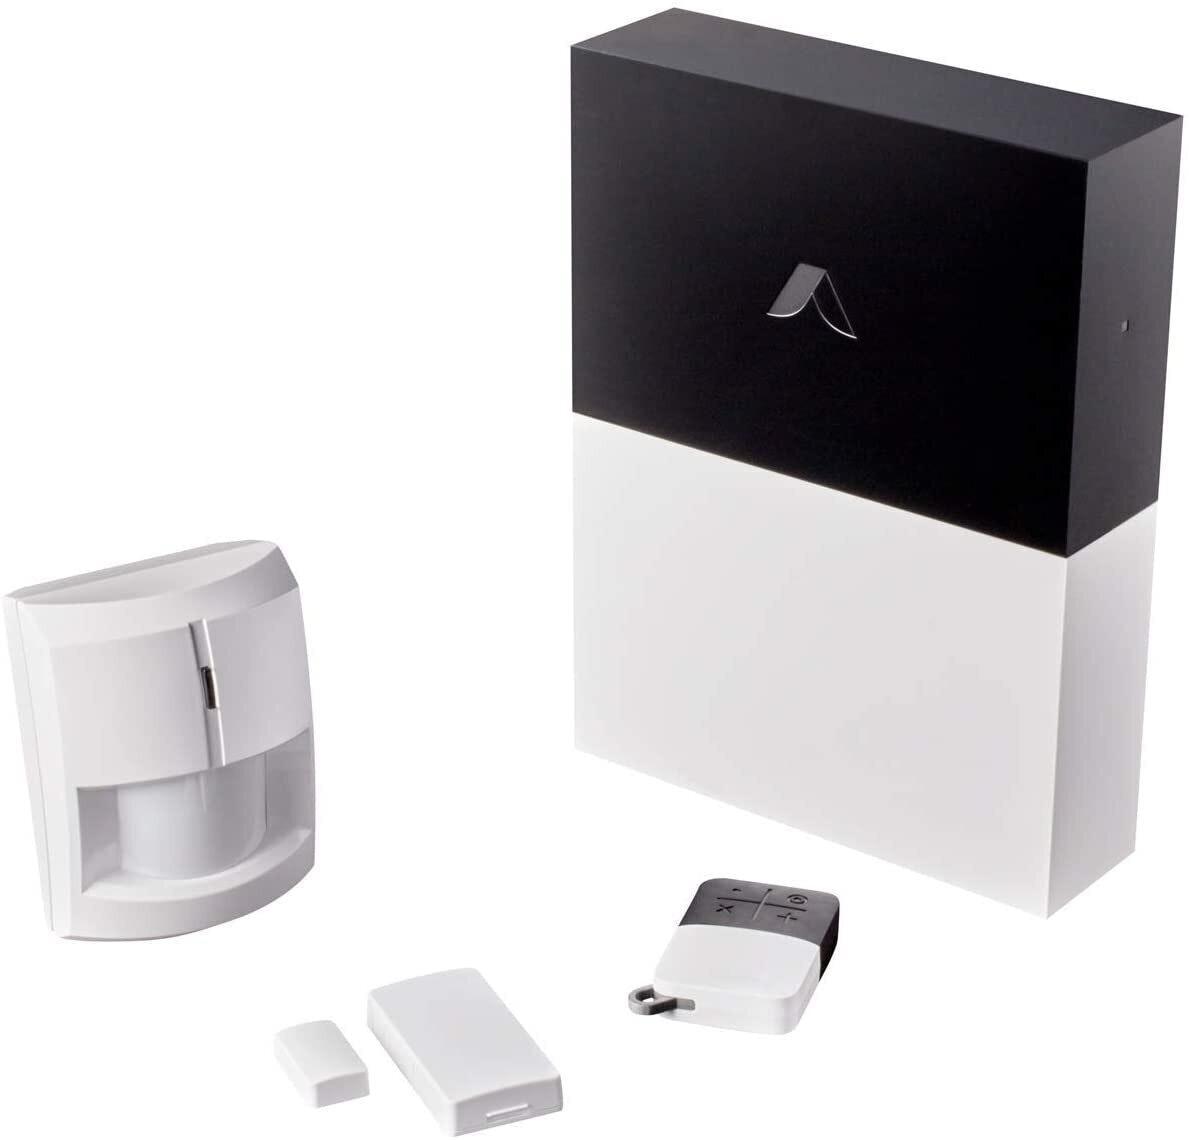 Abode Smart Security Kit